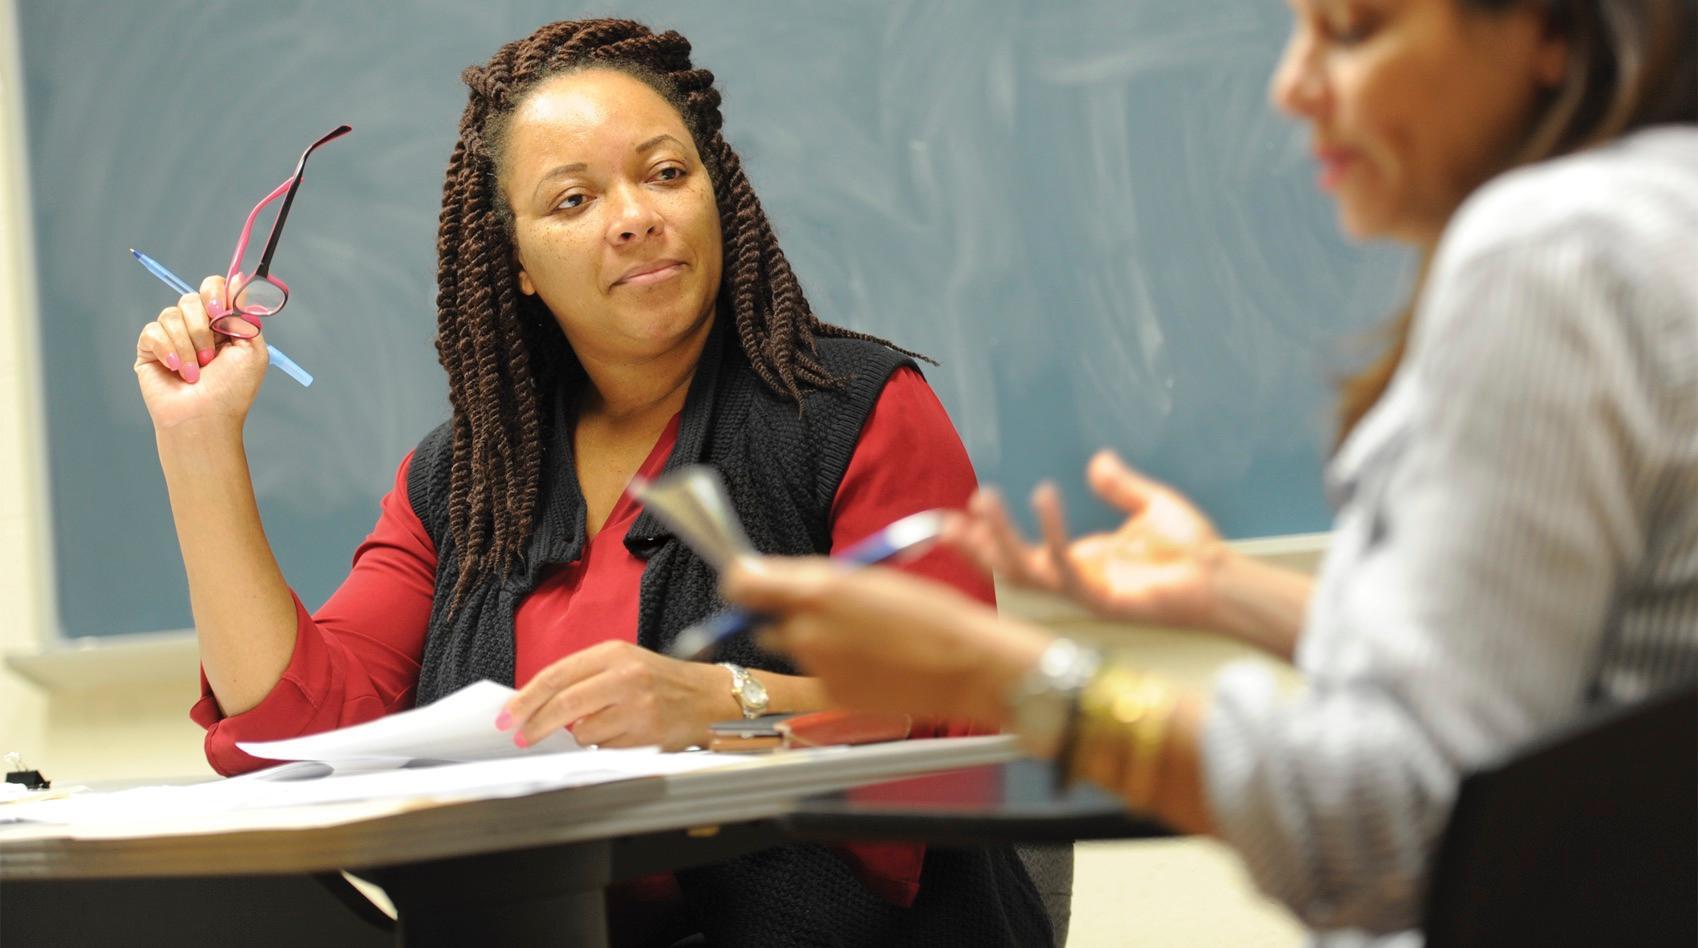 Adult Continuing Education at The Catholic University of America image 1